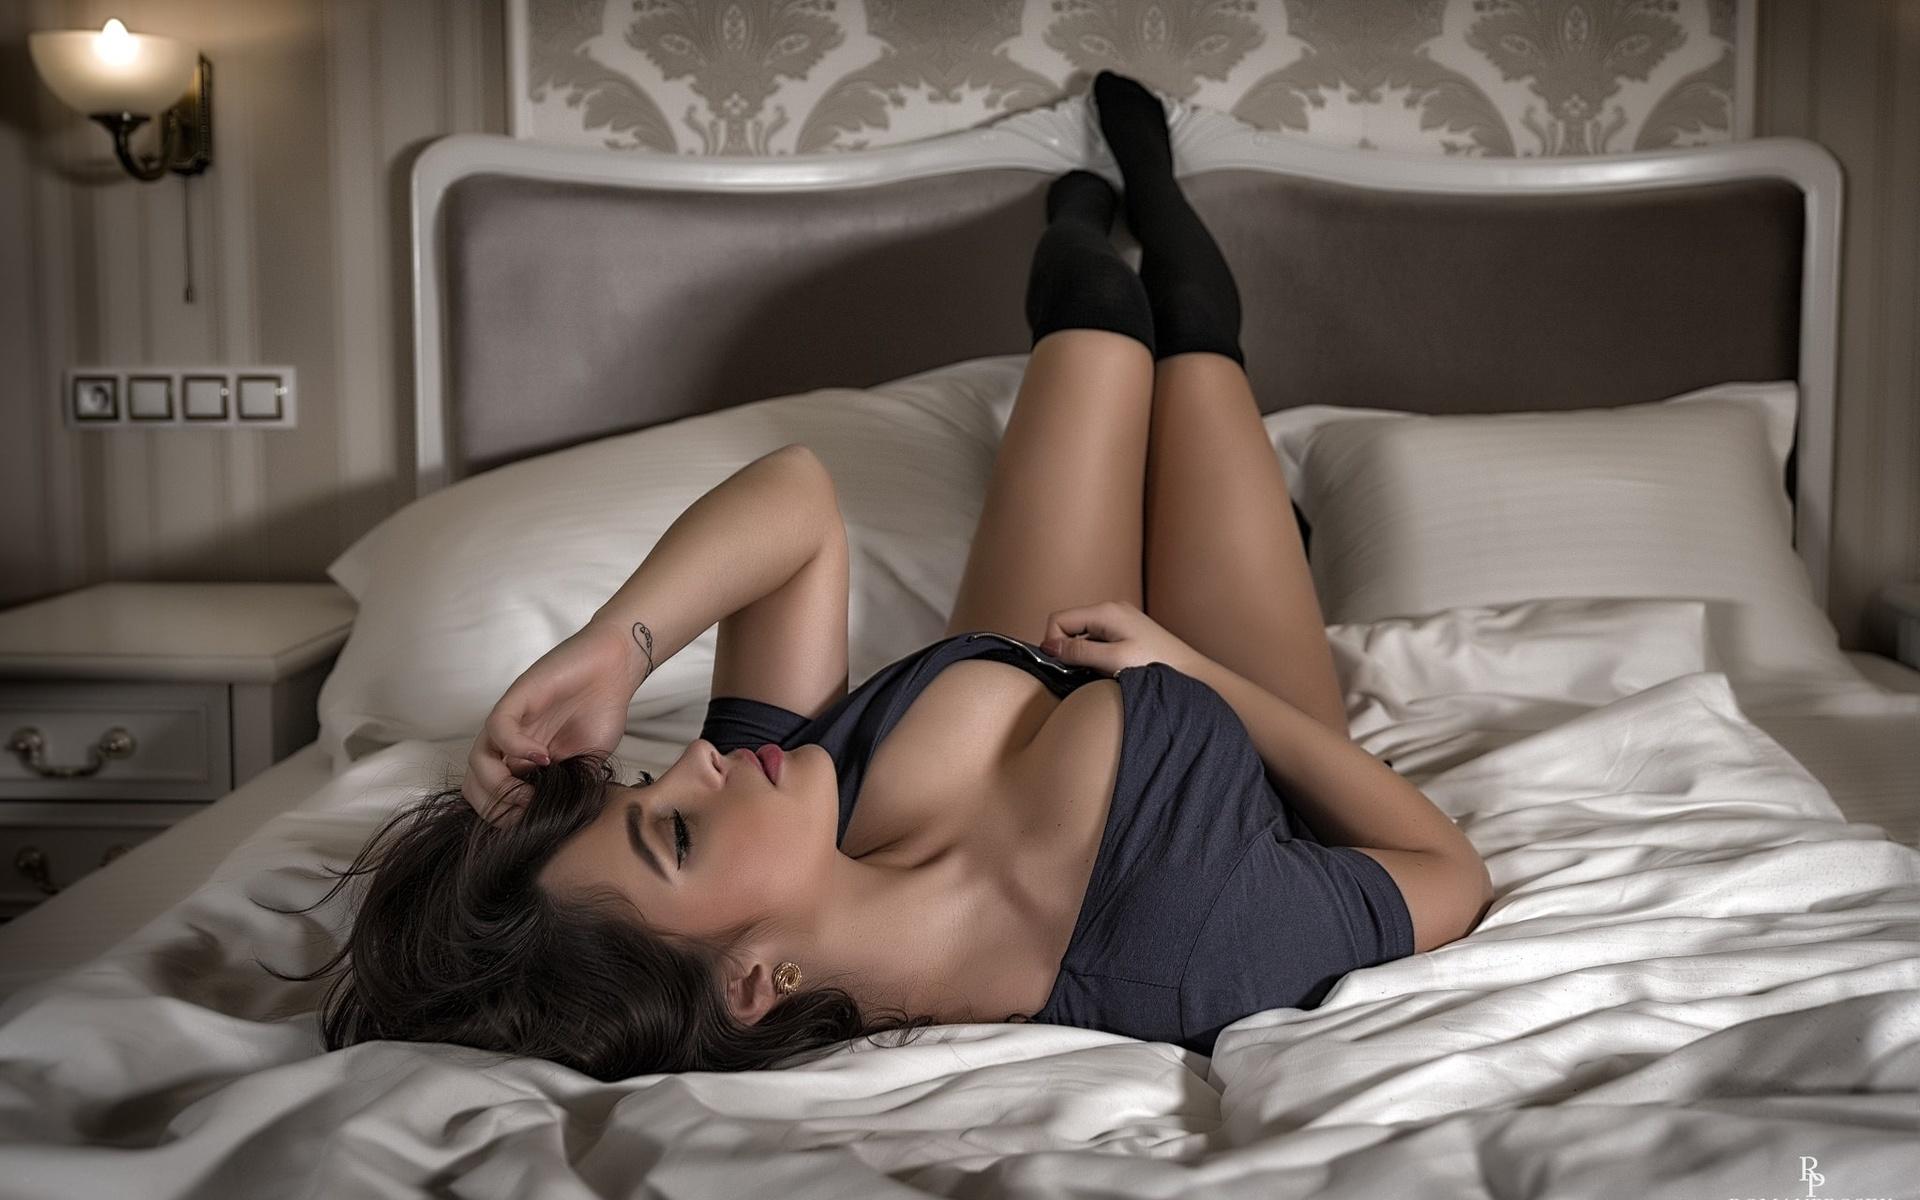 Картинки женщин в кровати